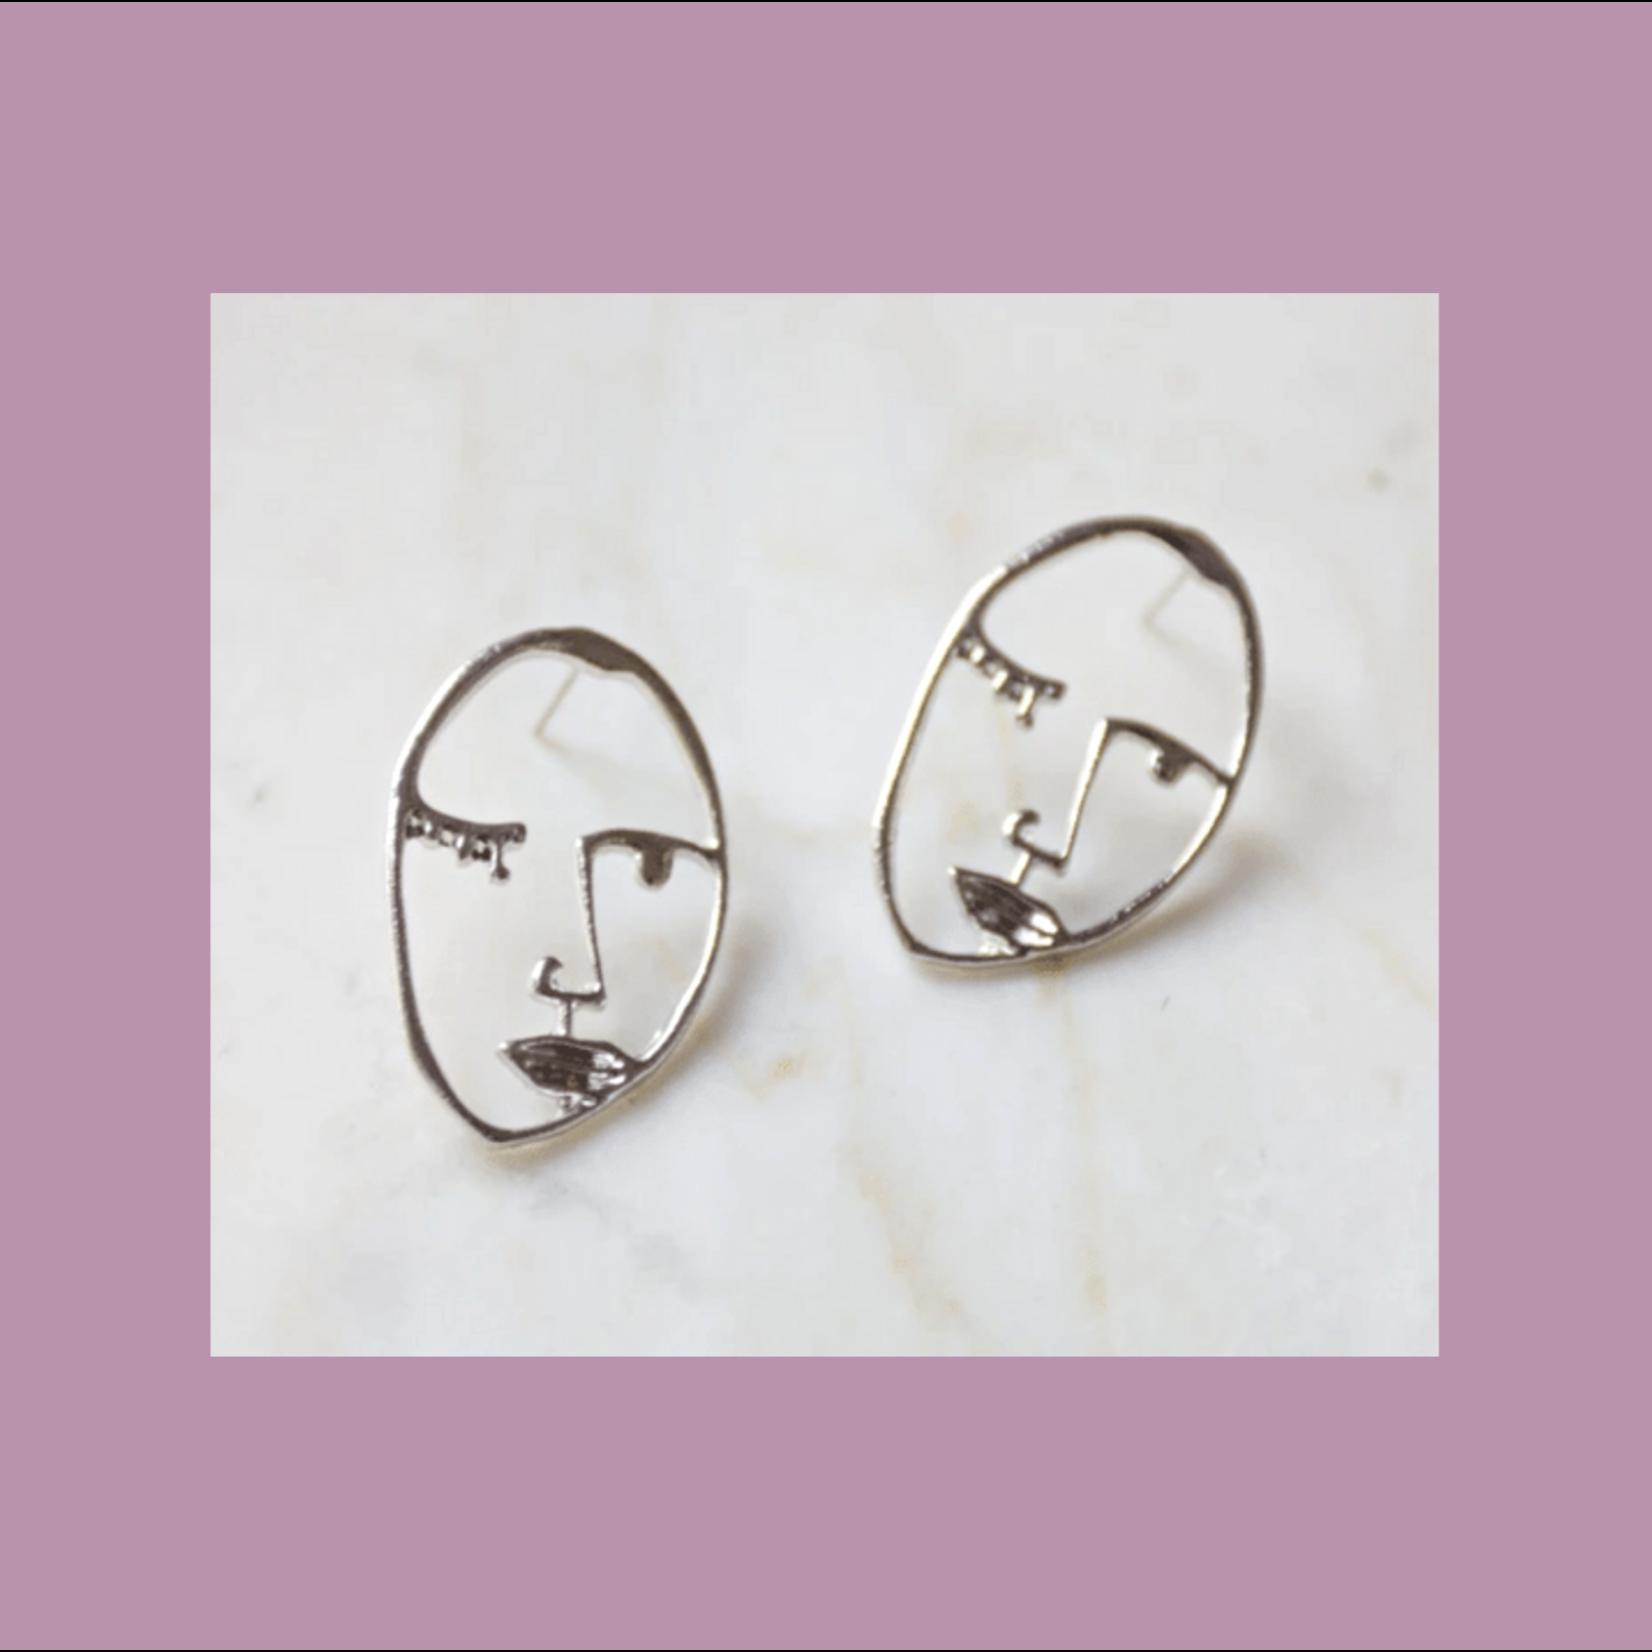 Oceanne (POC) Silver: Visage Face Stud Earrings